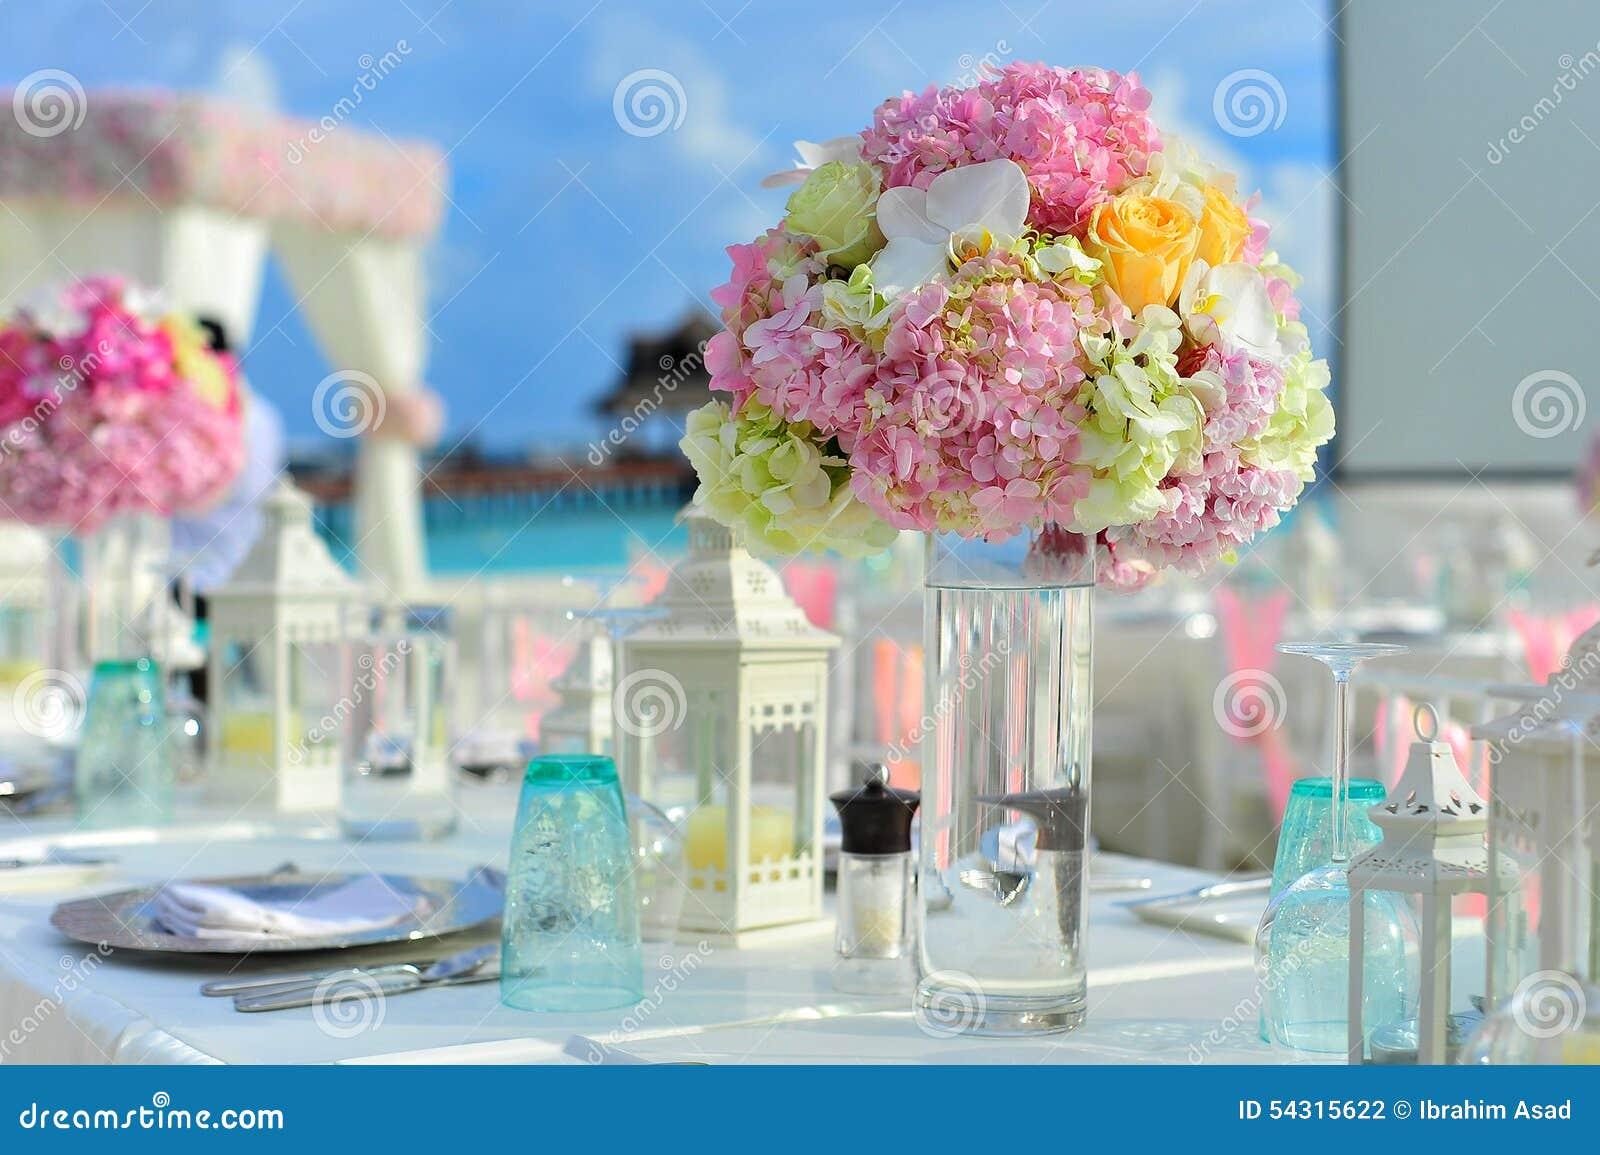 stock photo wedding centerpiece flowers candle flower holder image wedding centerpiece Wedding centerpiece flowers